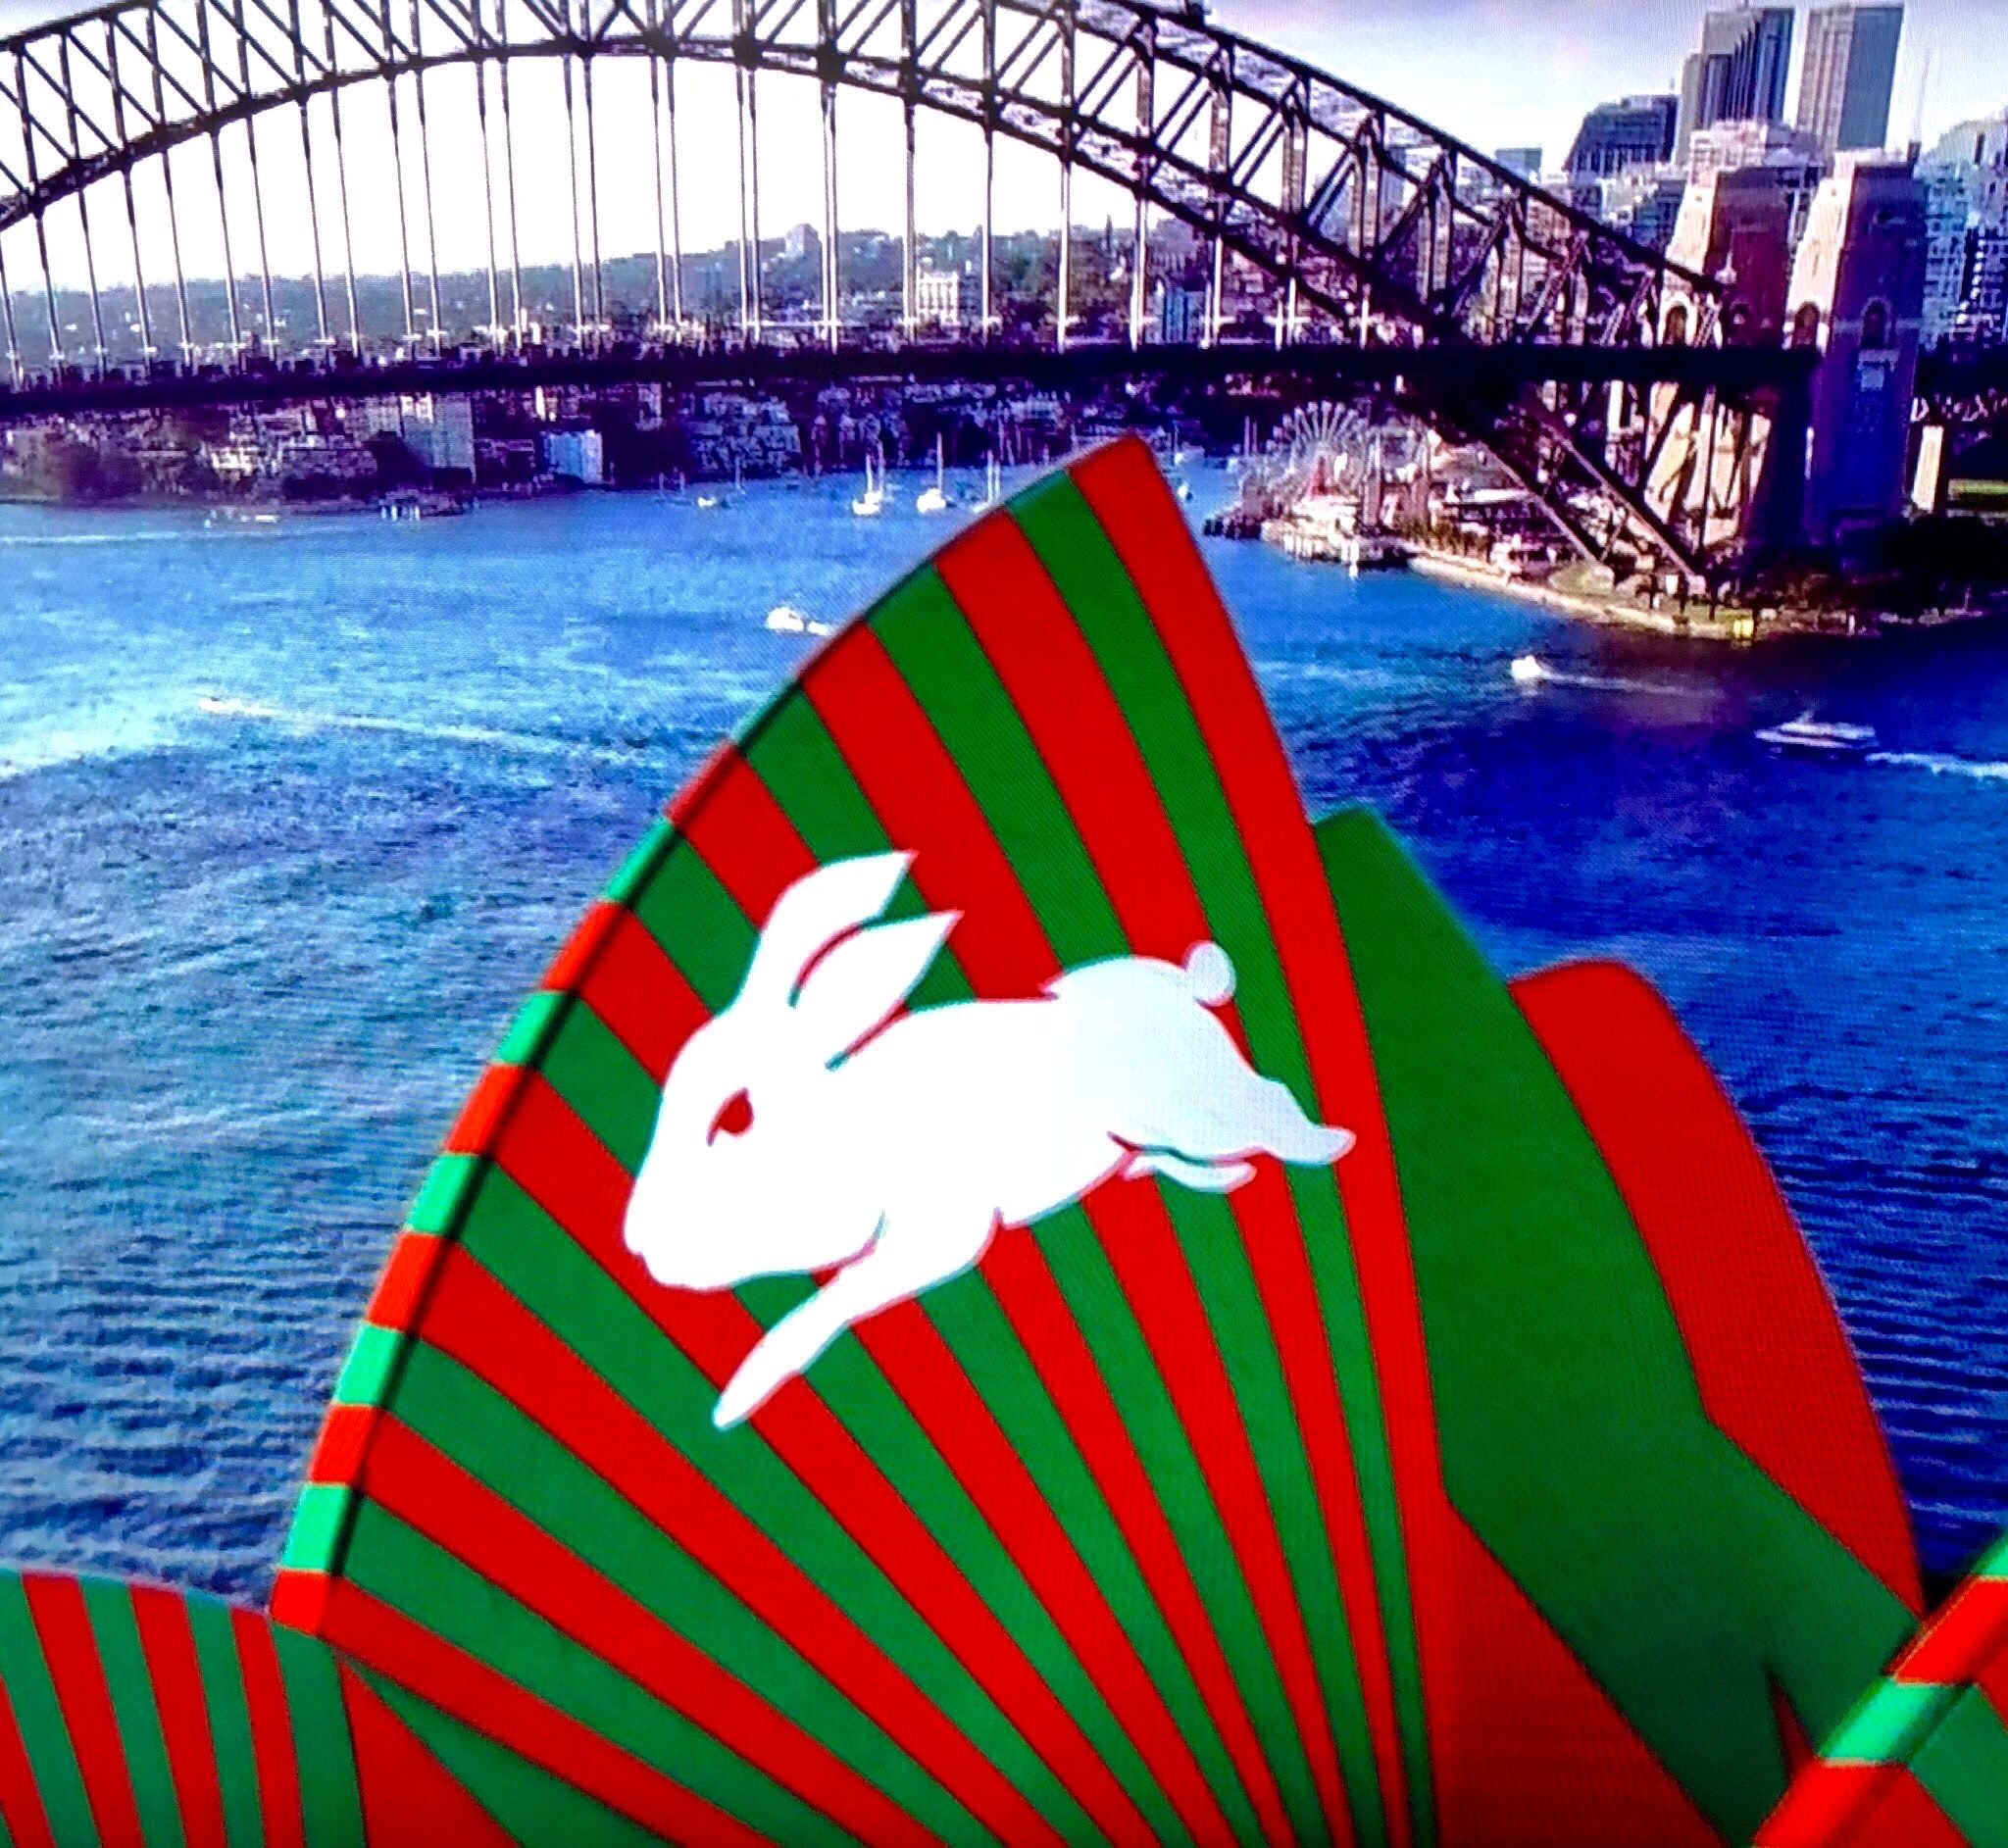 Pin By Jared Schnabl On South Sydney Rabbitohs Rabbits In Australia Vintage Dog Australian Football